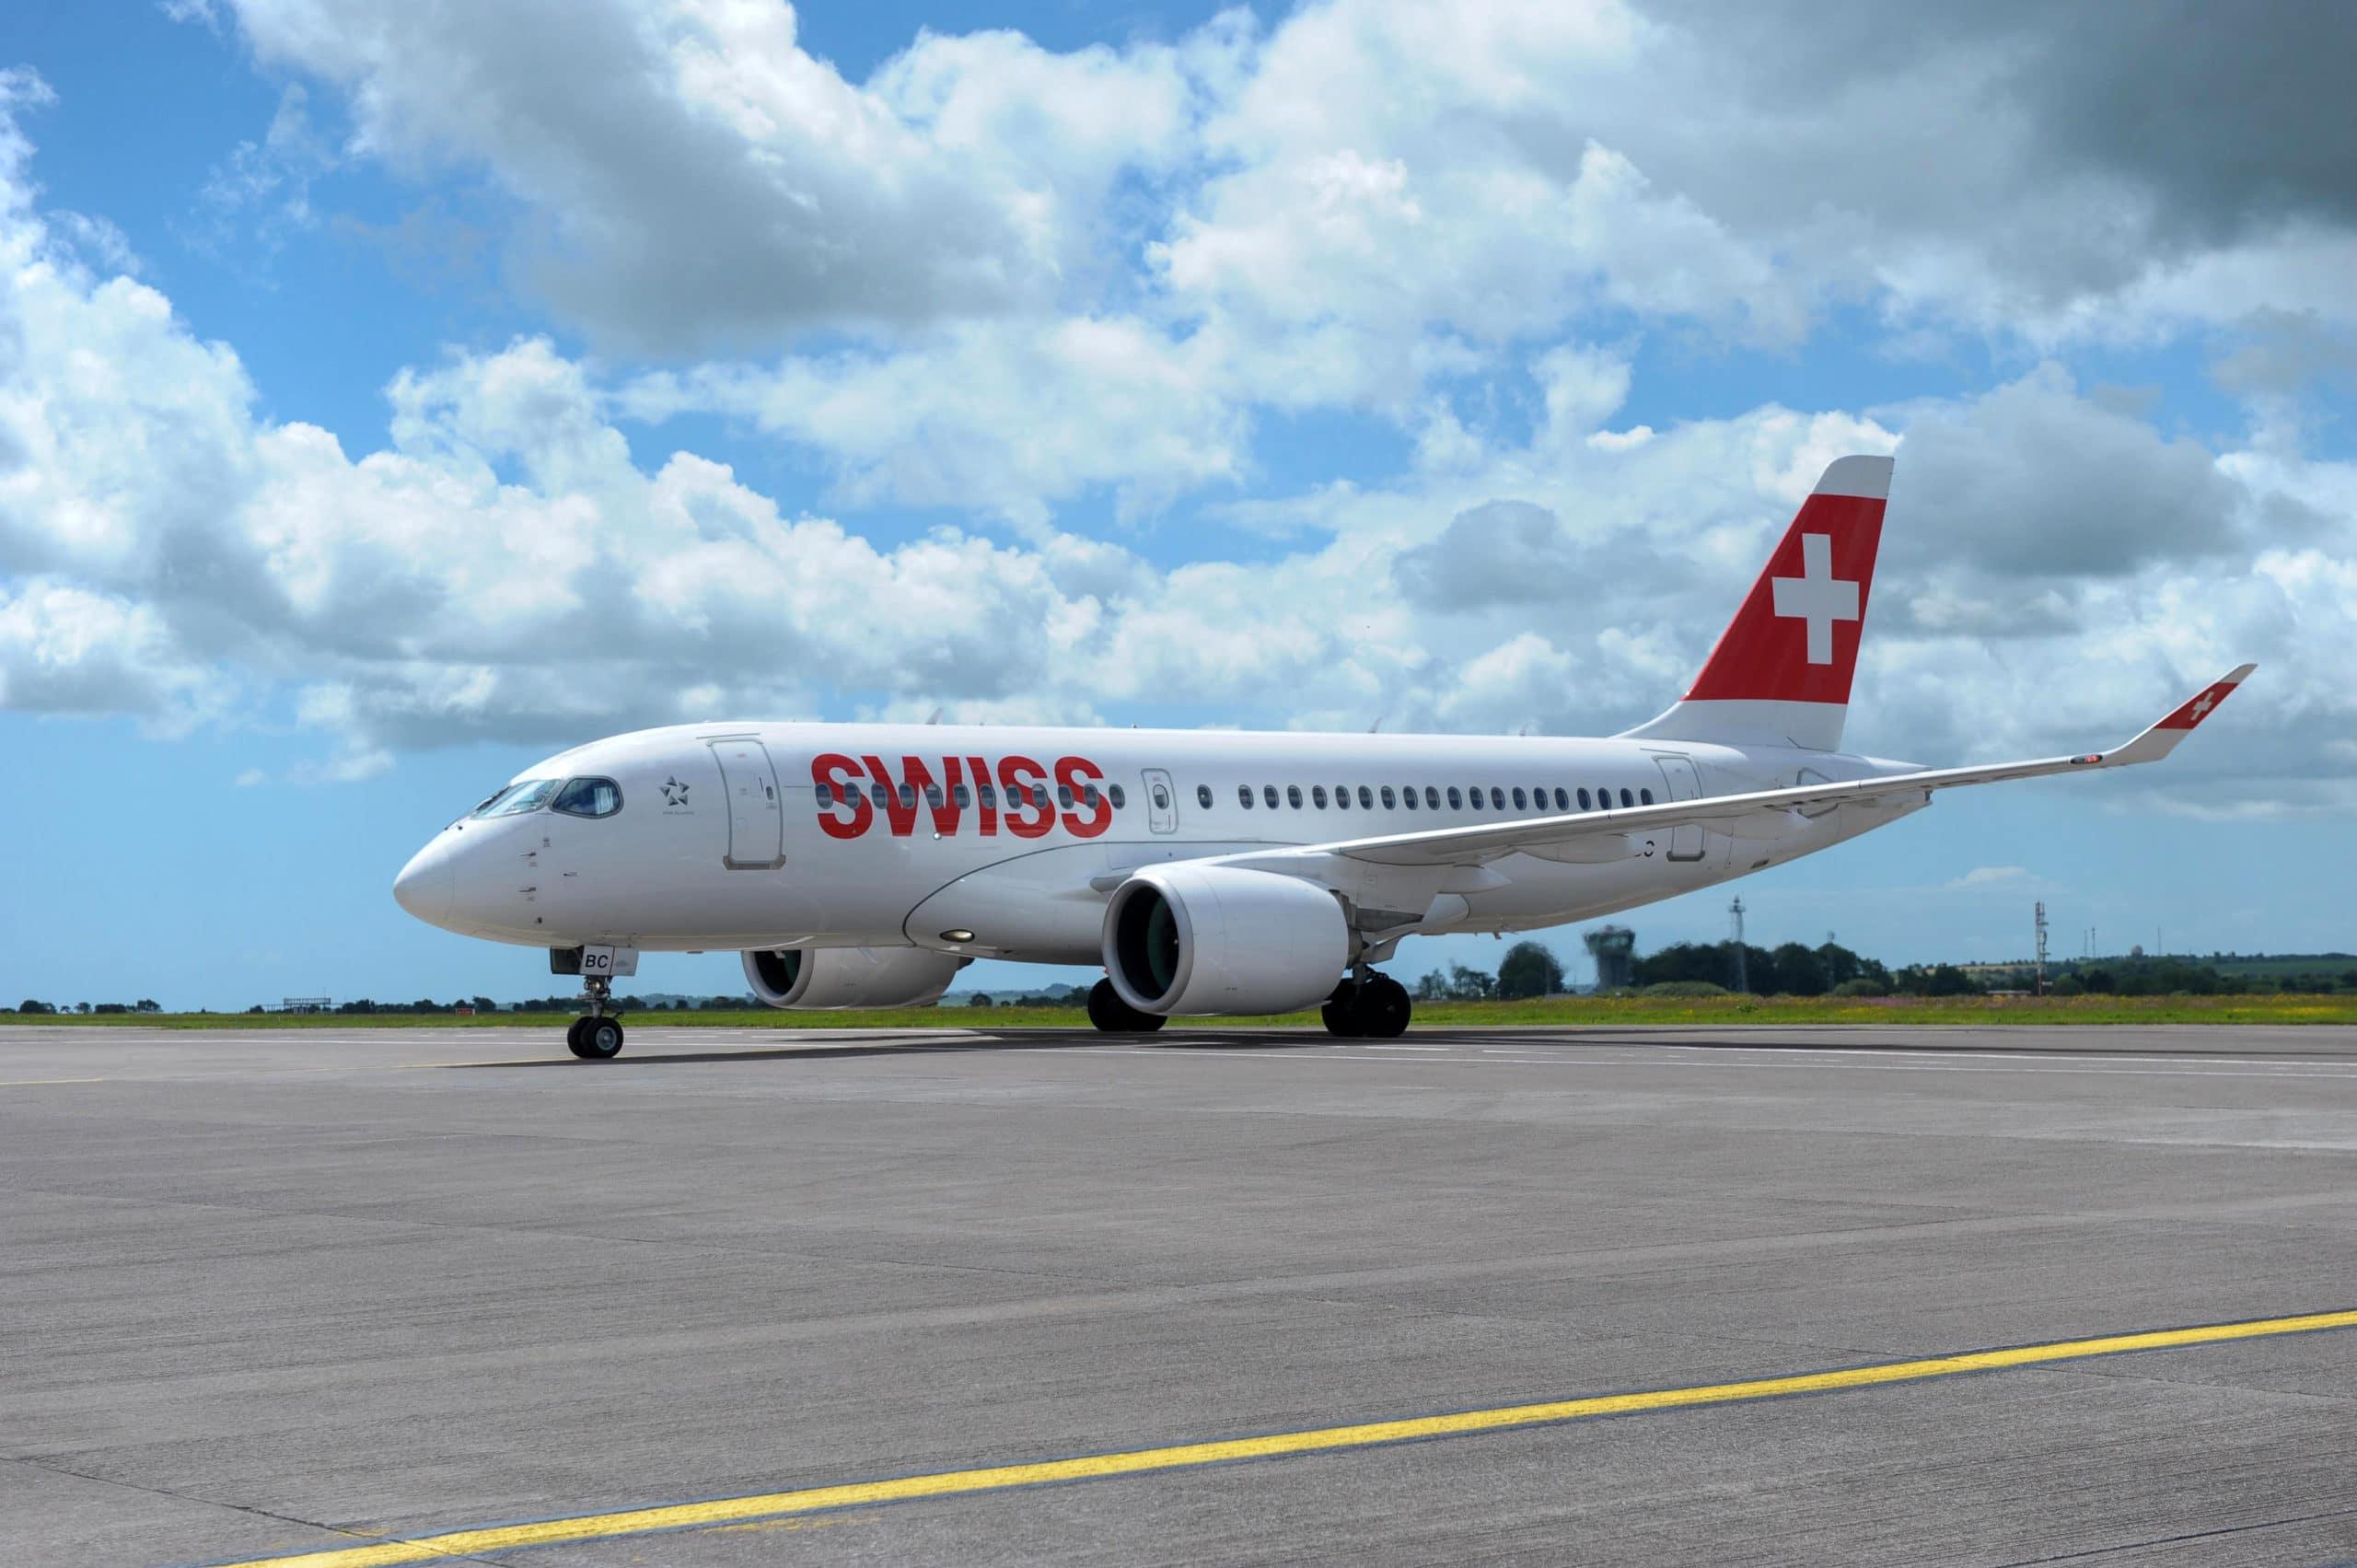 SWISS to resume Cork-Zurich service from July 5